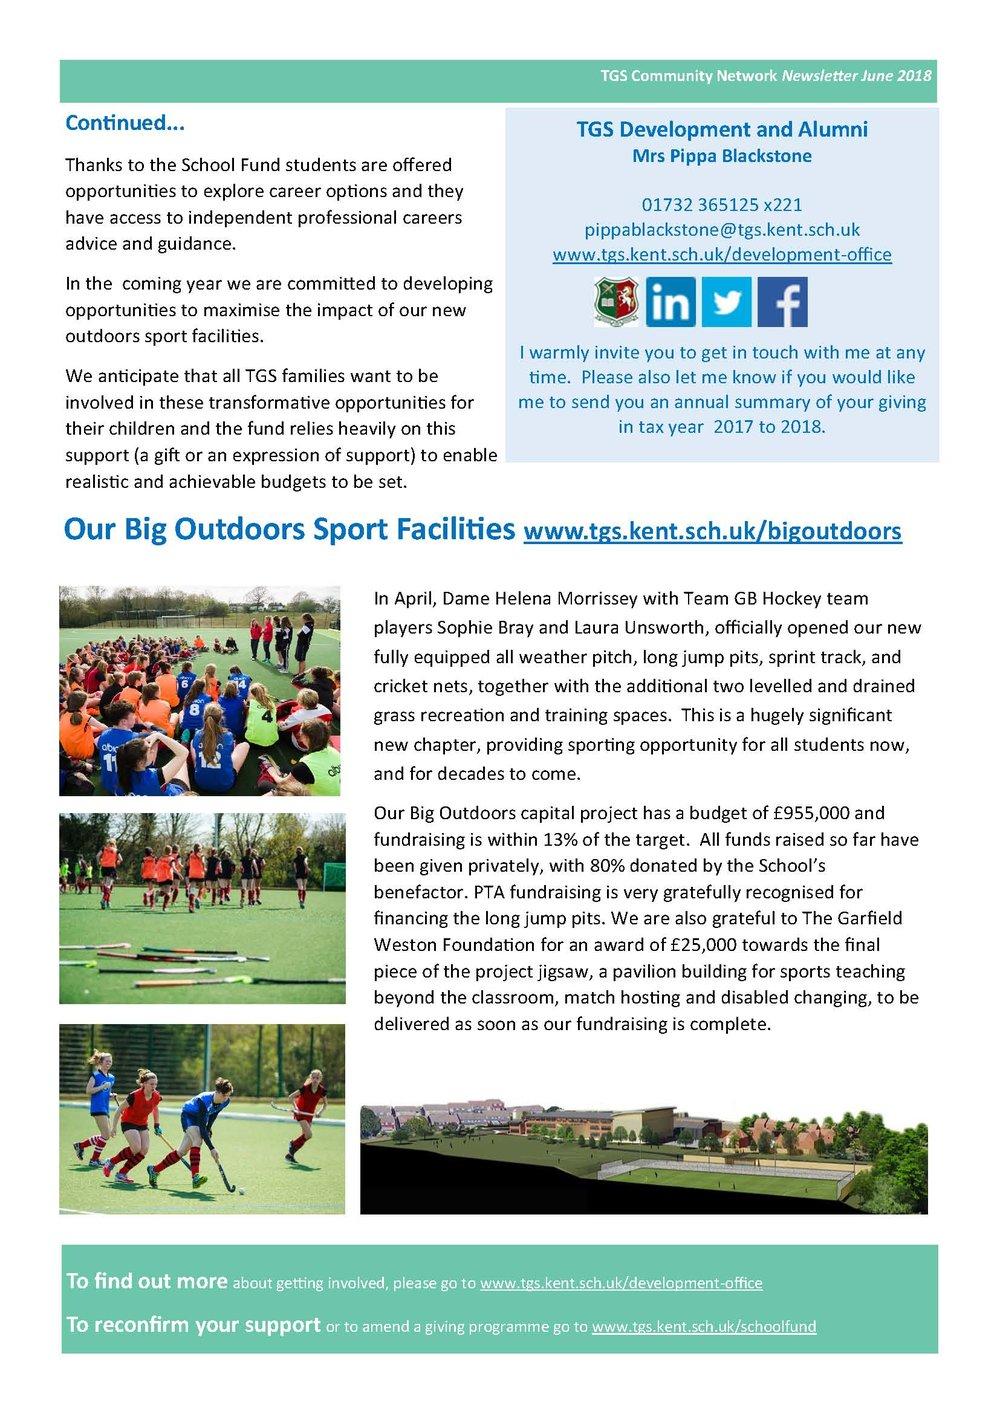 TGS HT Community Network Newsletter June 2018_Page_2.jpg